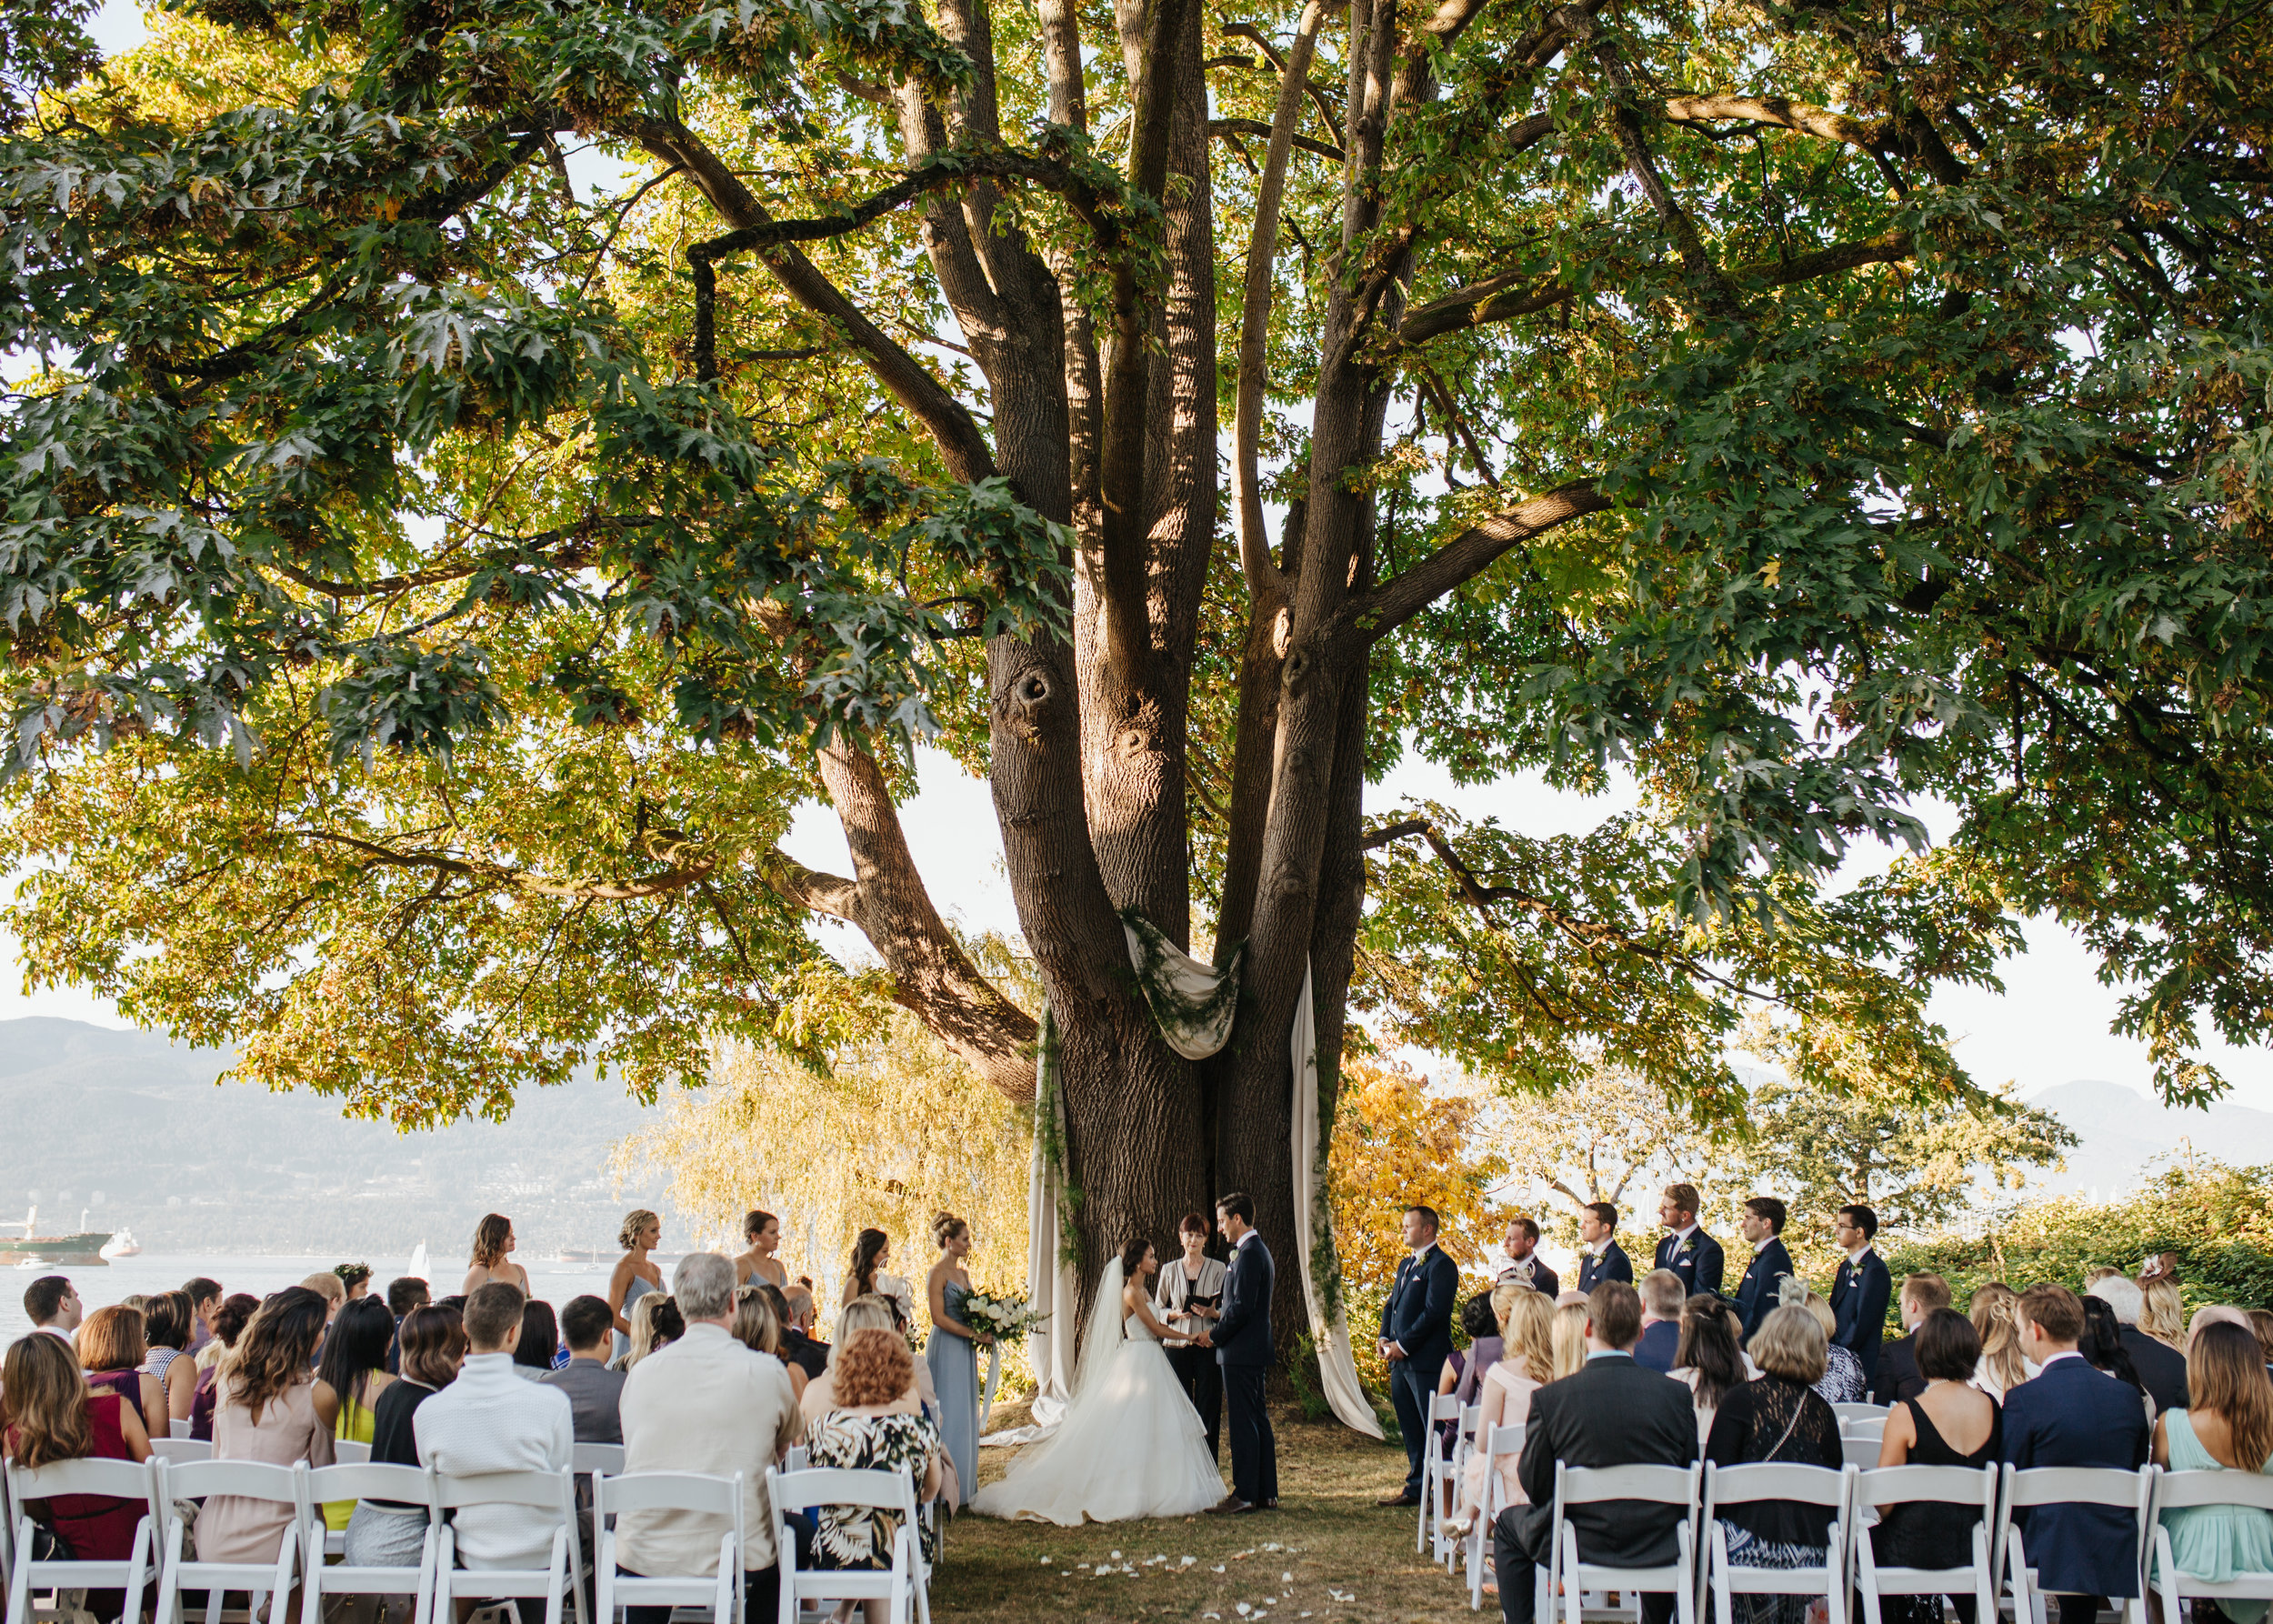 herafilms_carlotta_alex_wedding_hera_highres-47.jpg